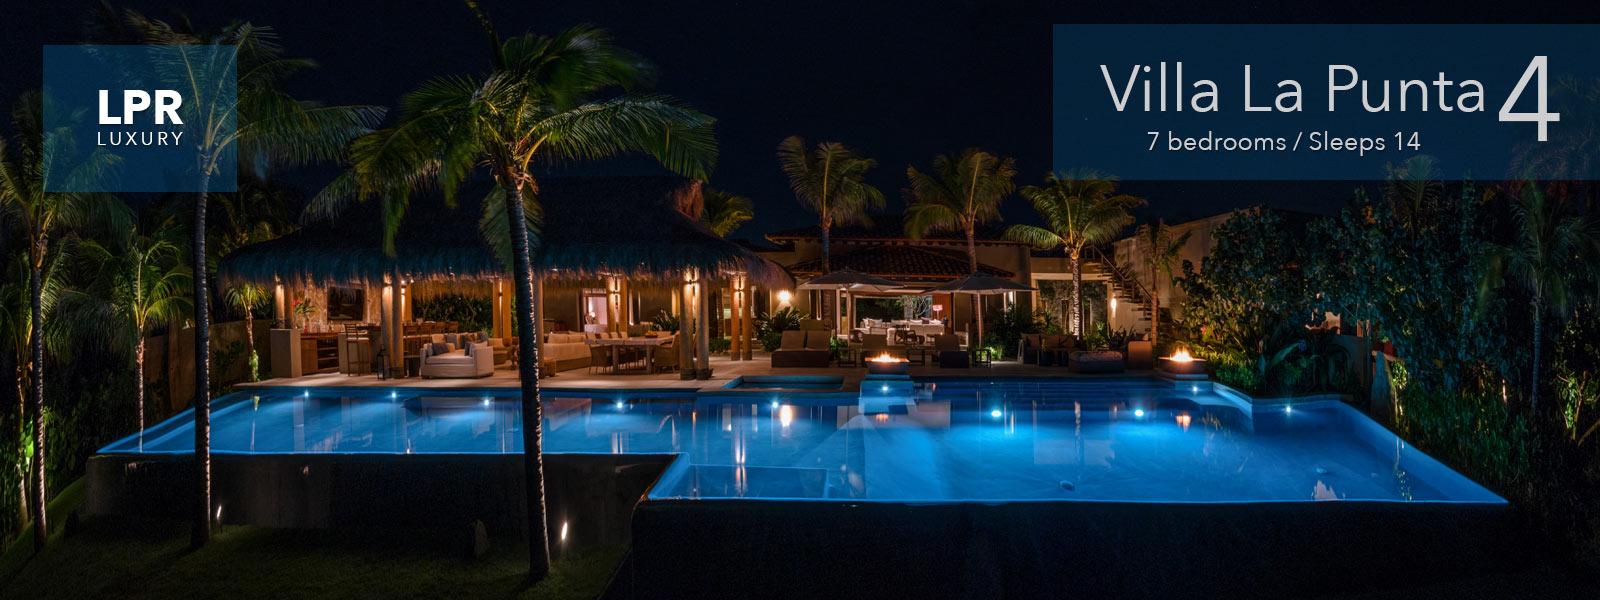 Villa La Punta 4 - Punta Mita Resort - Riviera Nayarit, Mexico